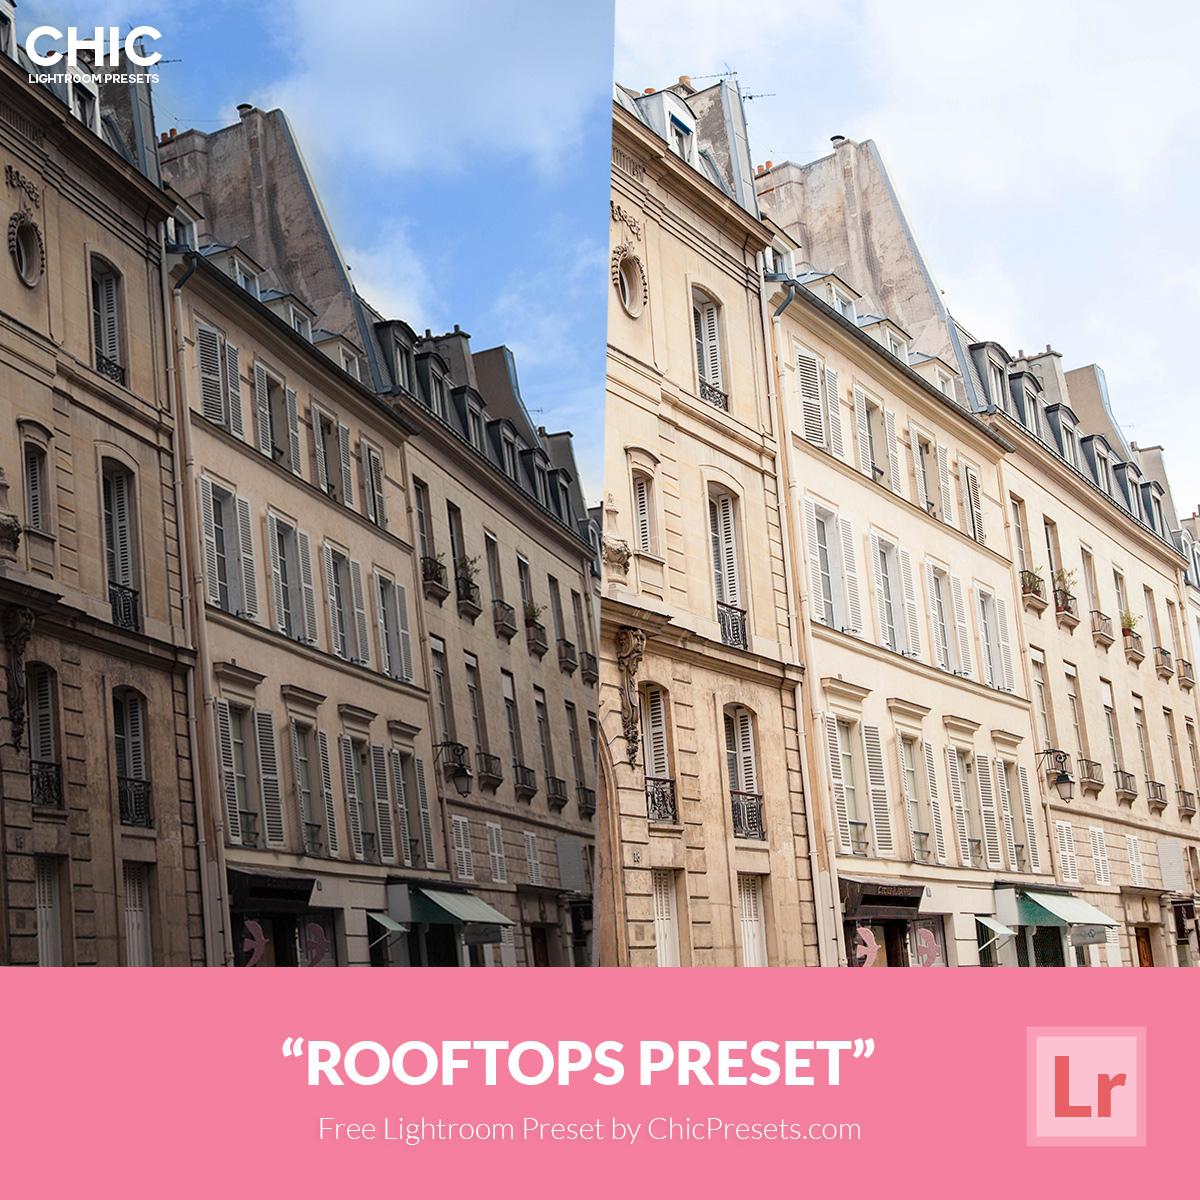 Free Chic Lightroom Preset Rooftops